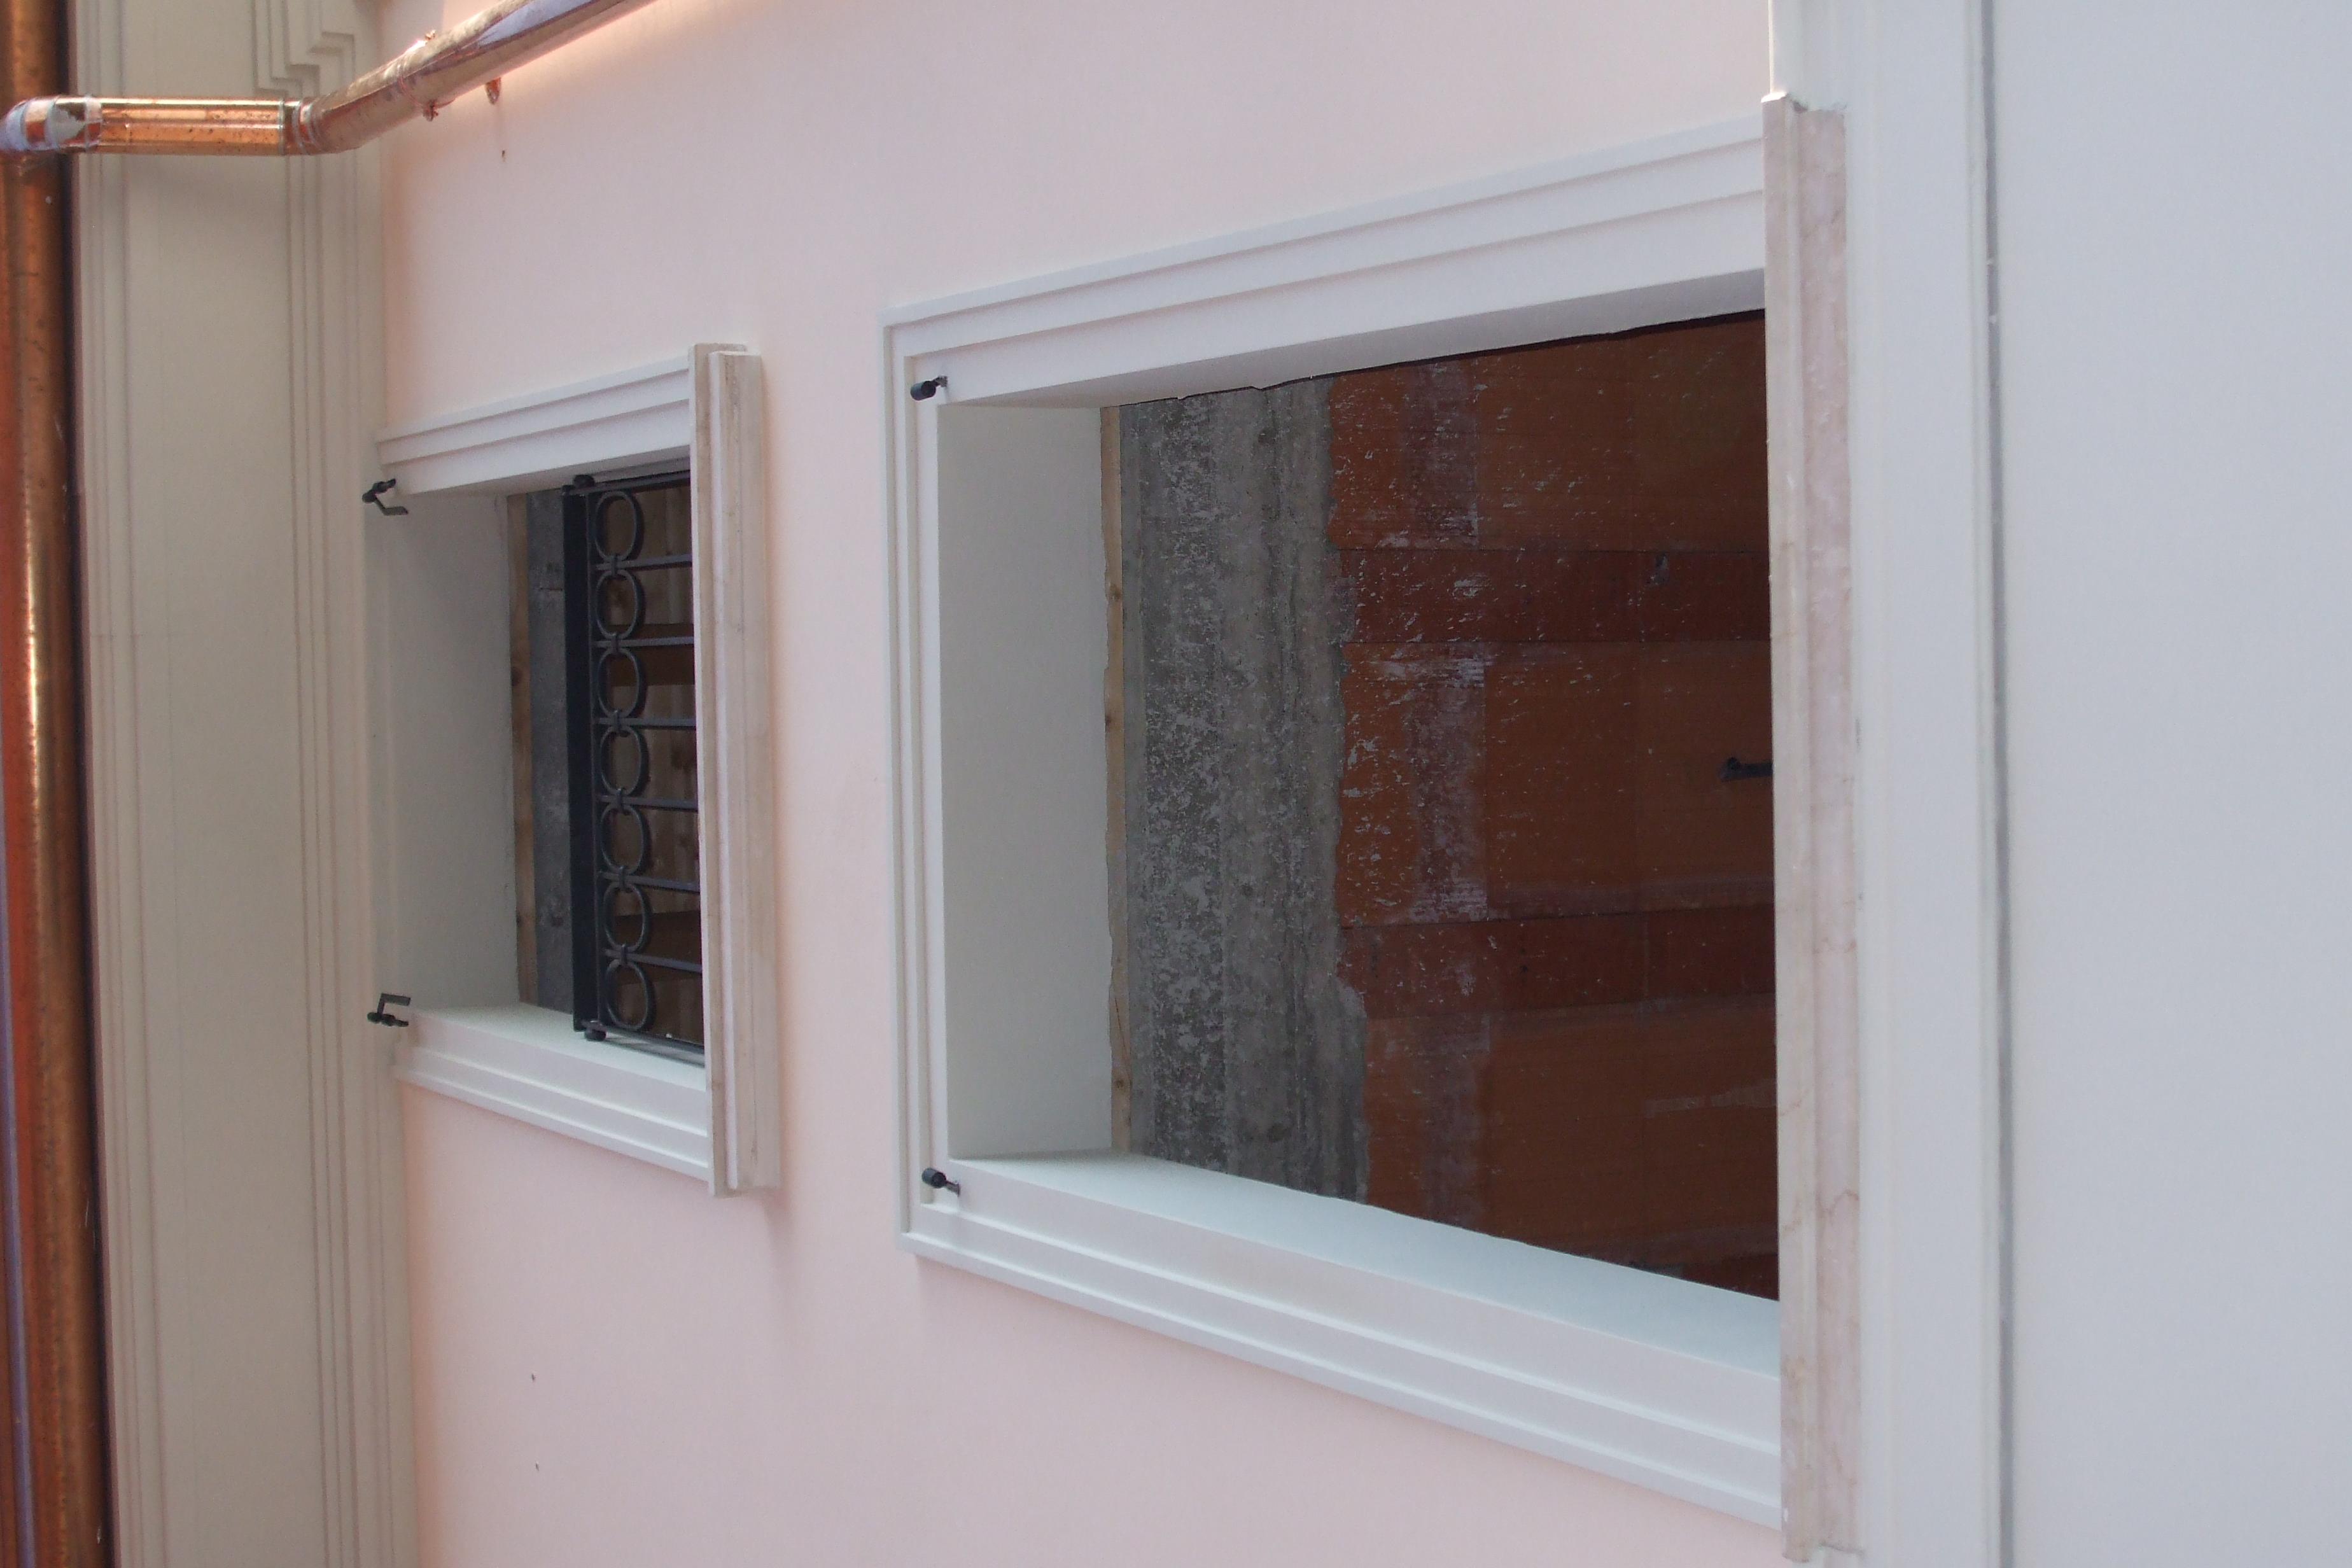 Fasce a finestra fiammetti dal 1977 - Decori in gesso per interni ...